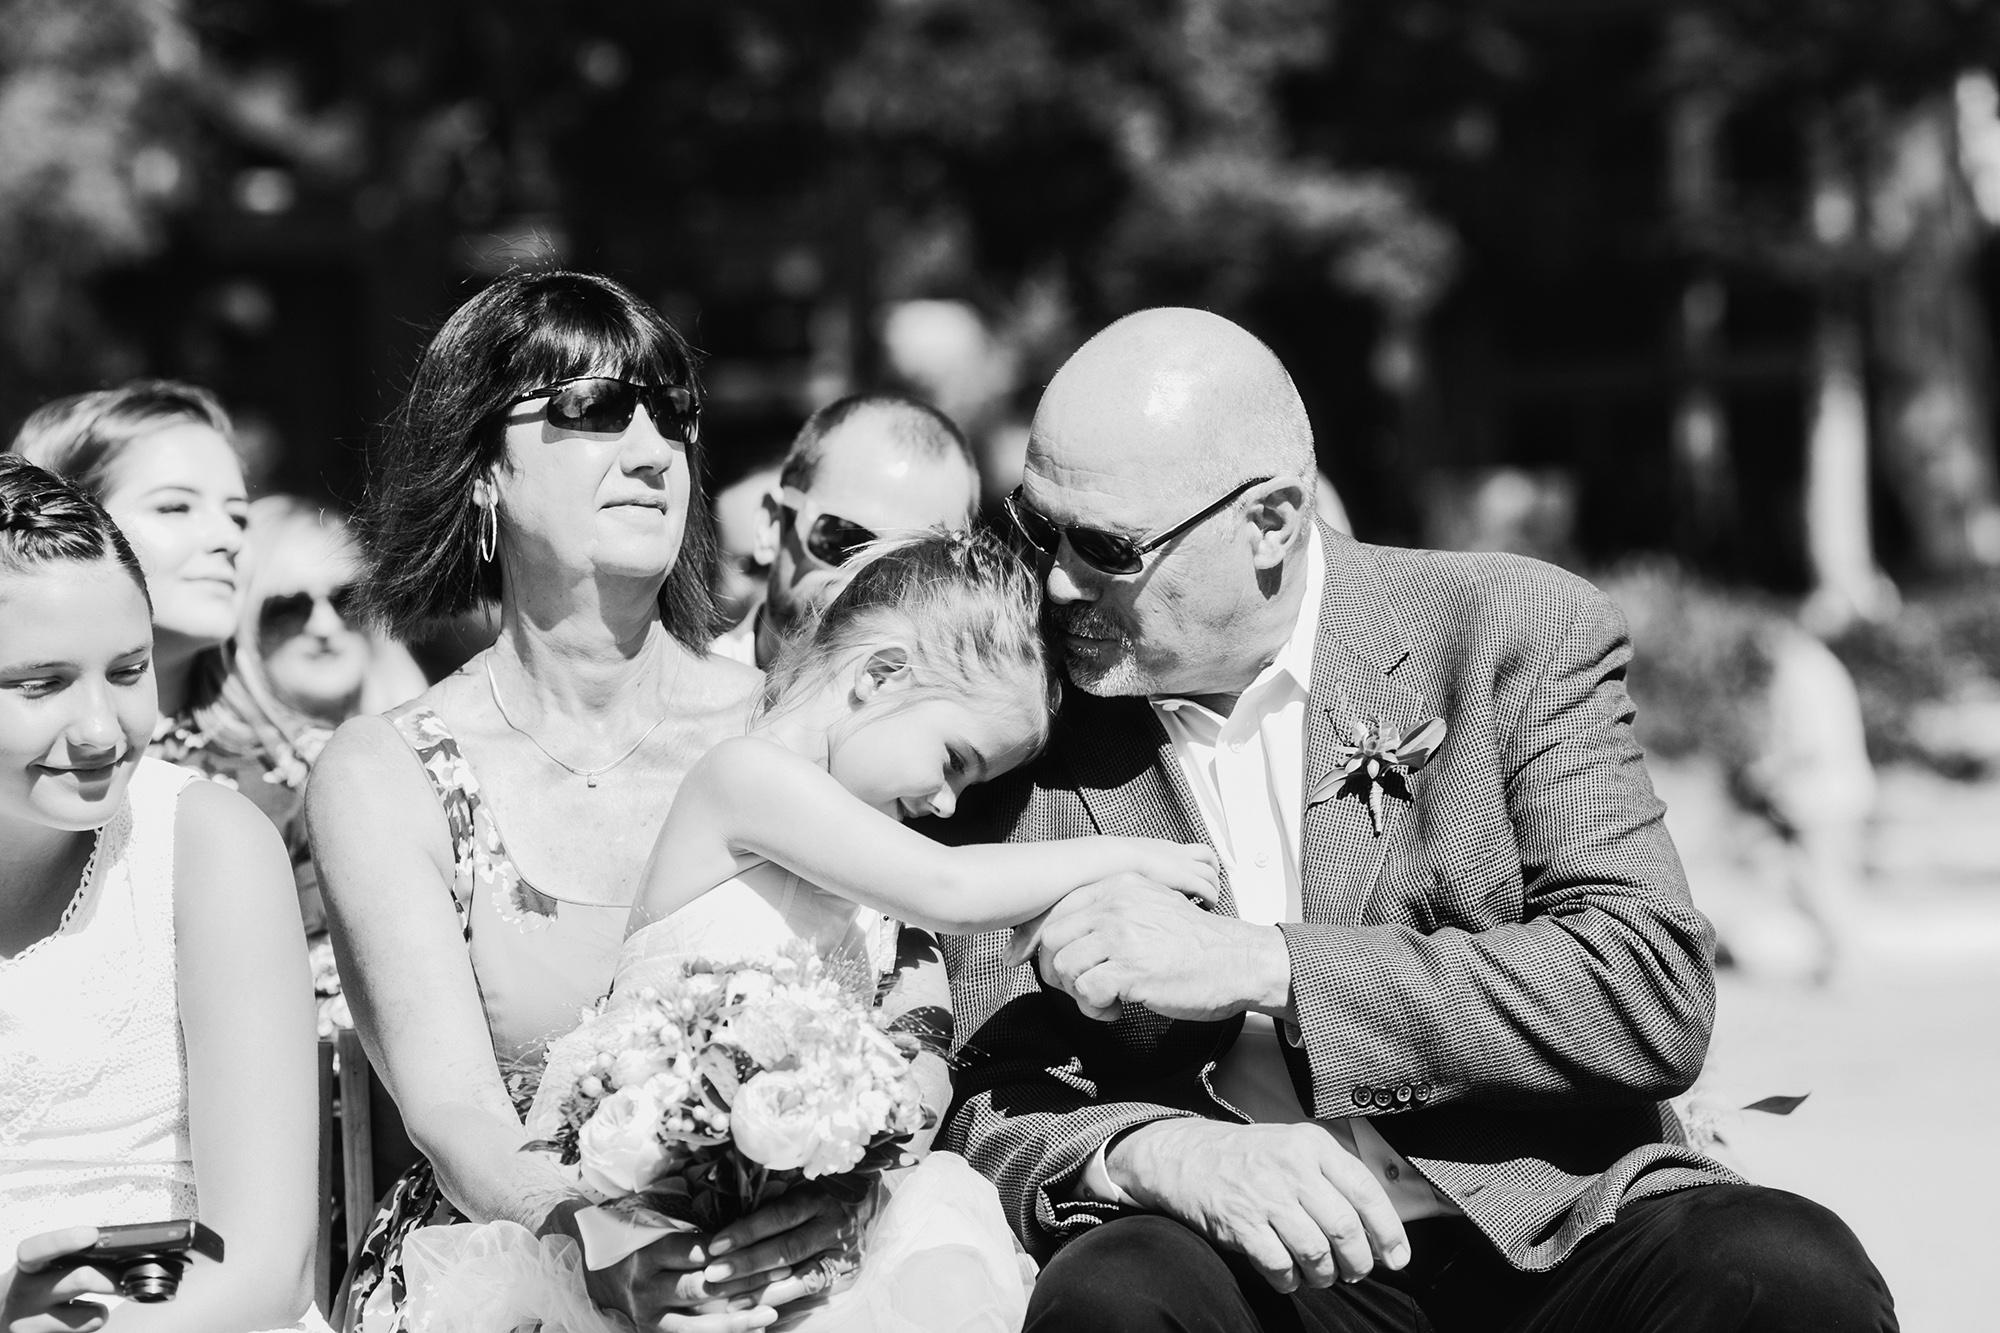 Tofino-Botanical-Gardens-Wedding-Photos-0046.jpg